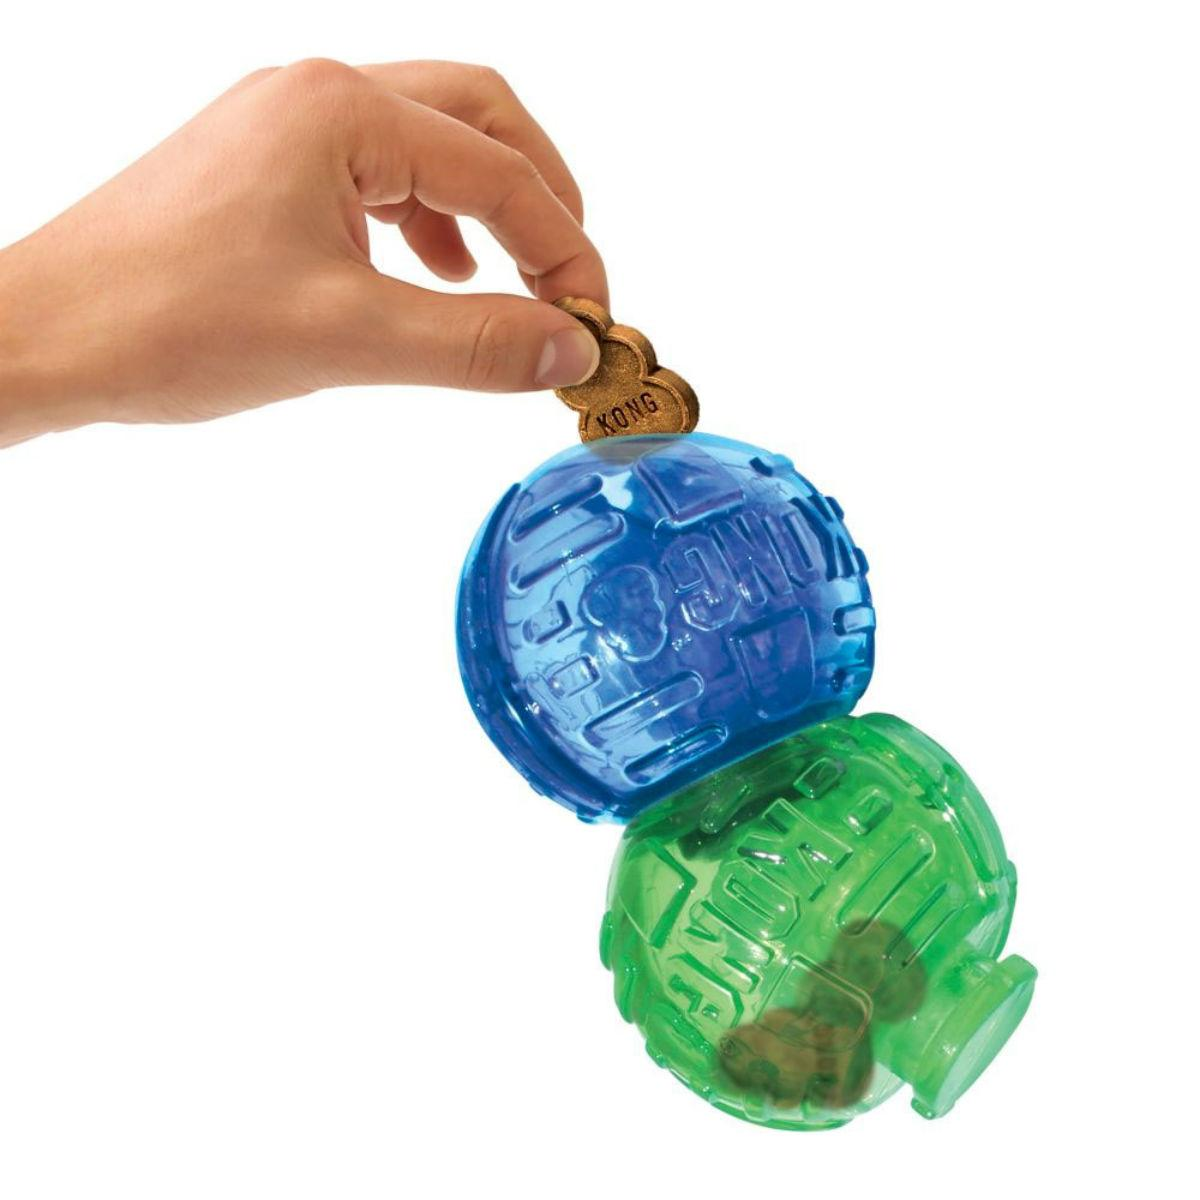 KONG Lock-it Treat Puzzle Dog Toy